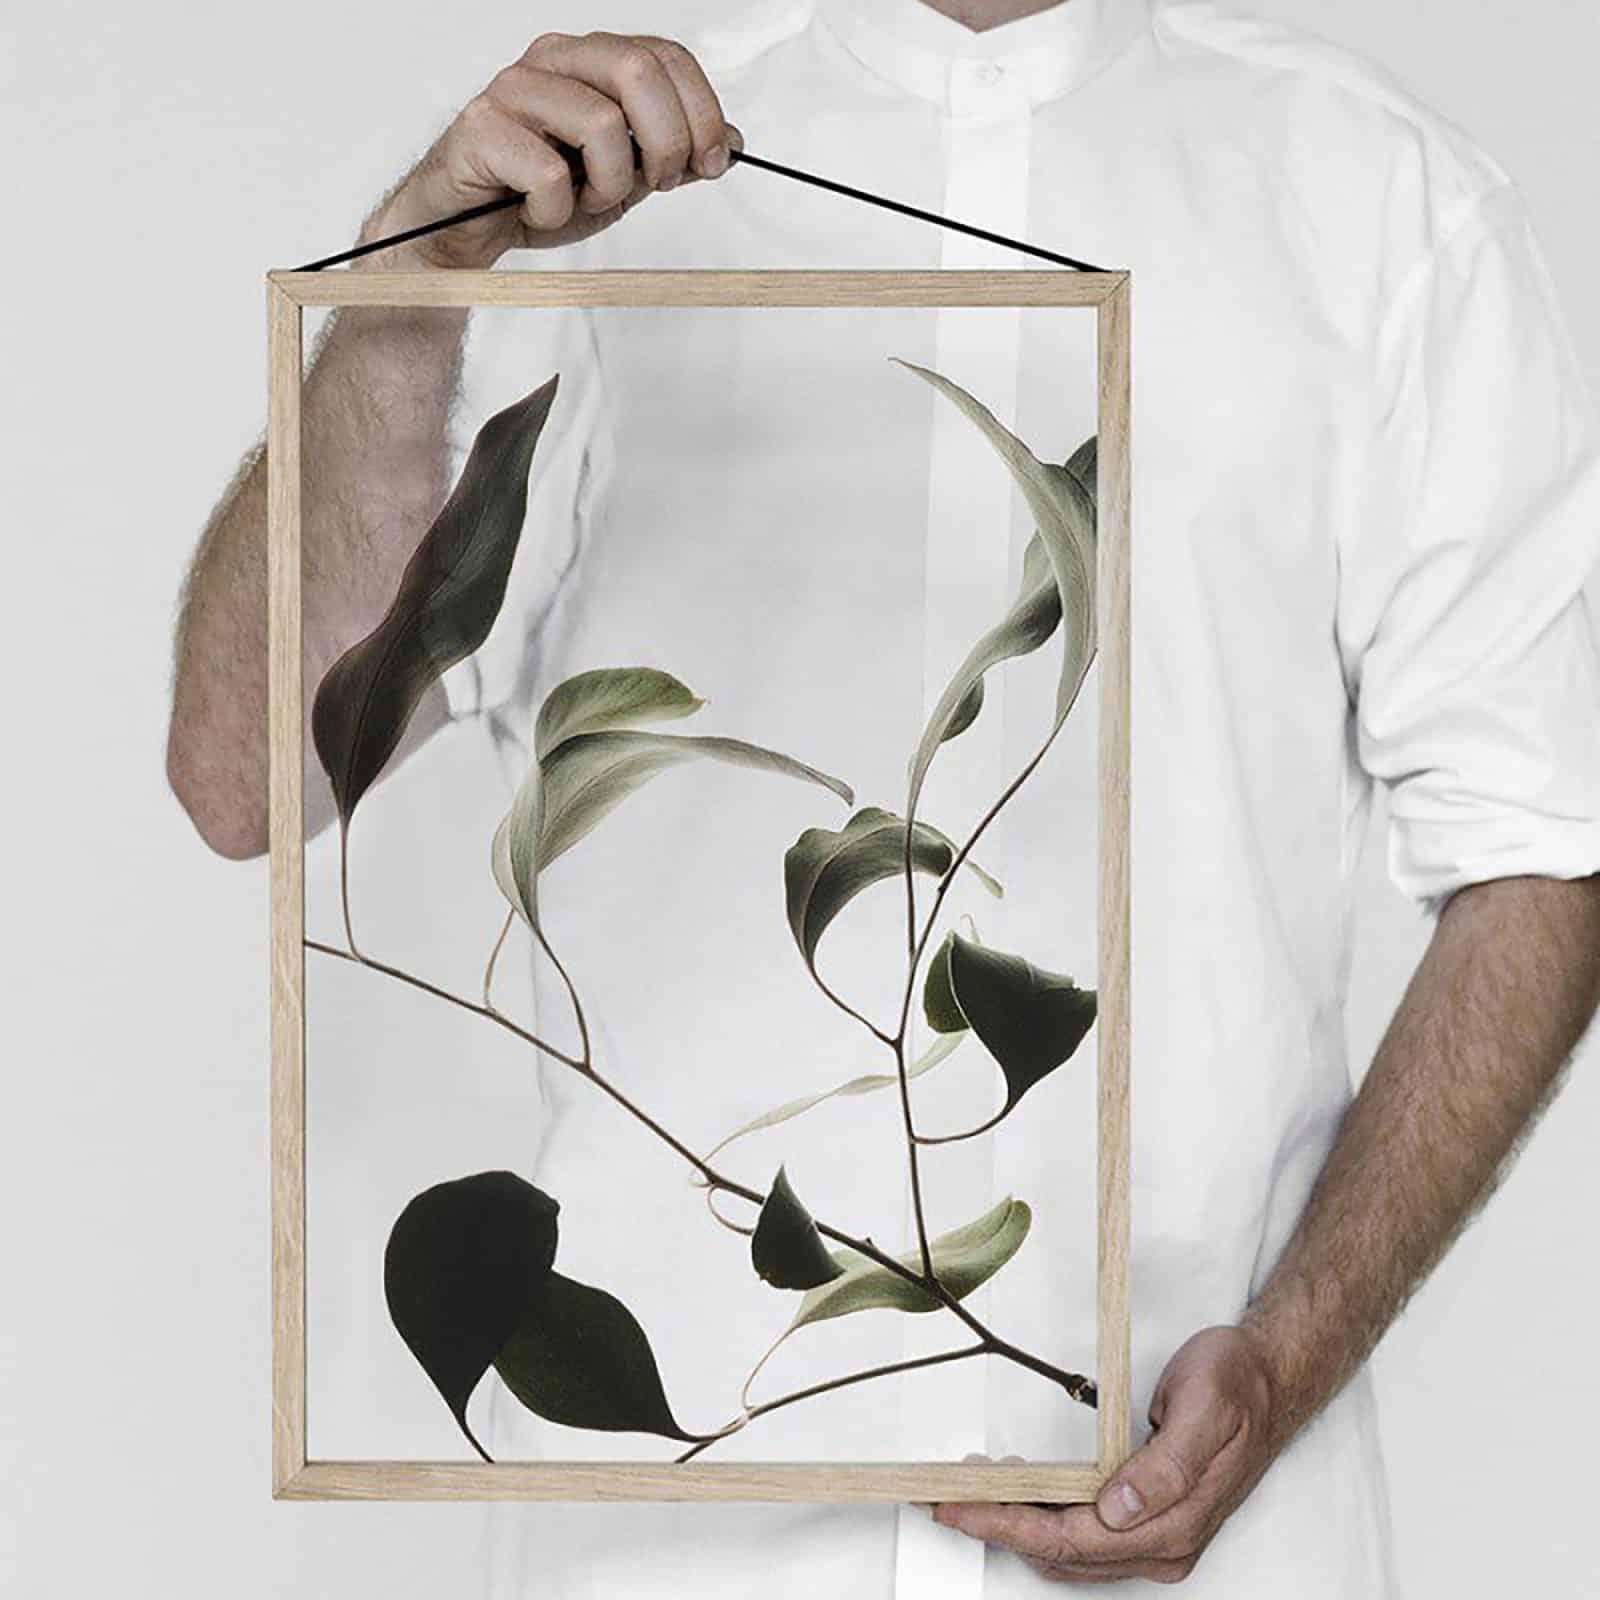 99regali regali di design Floating leaves